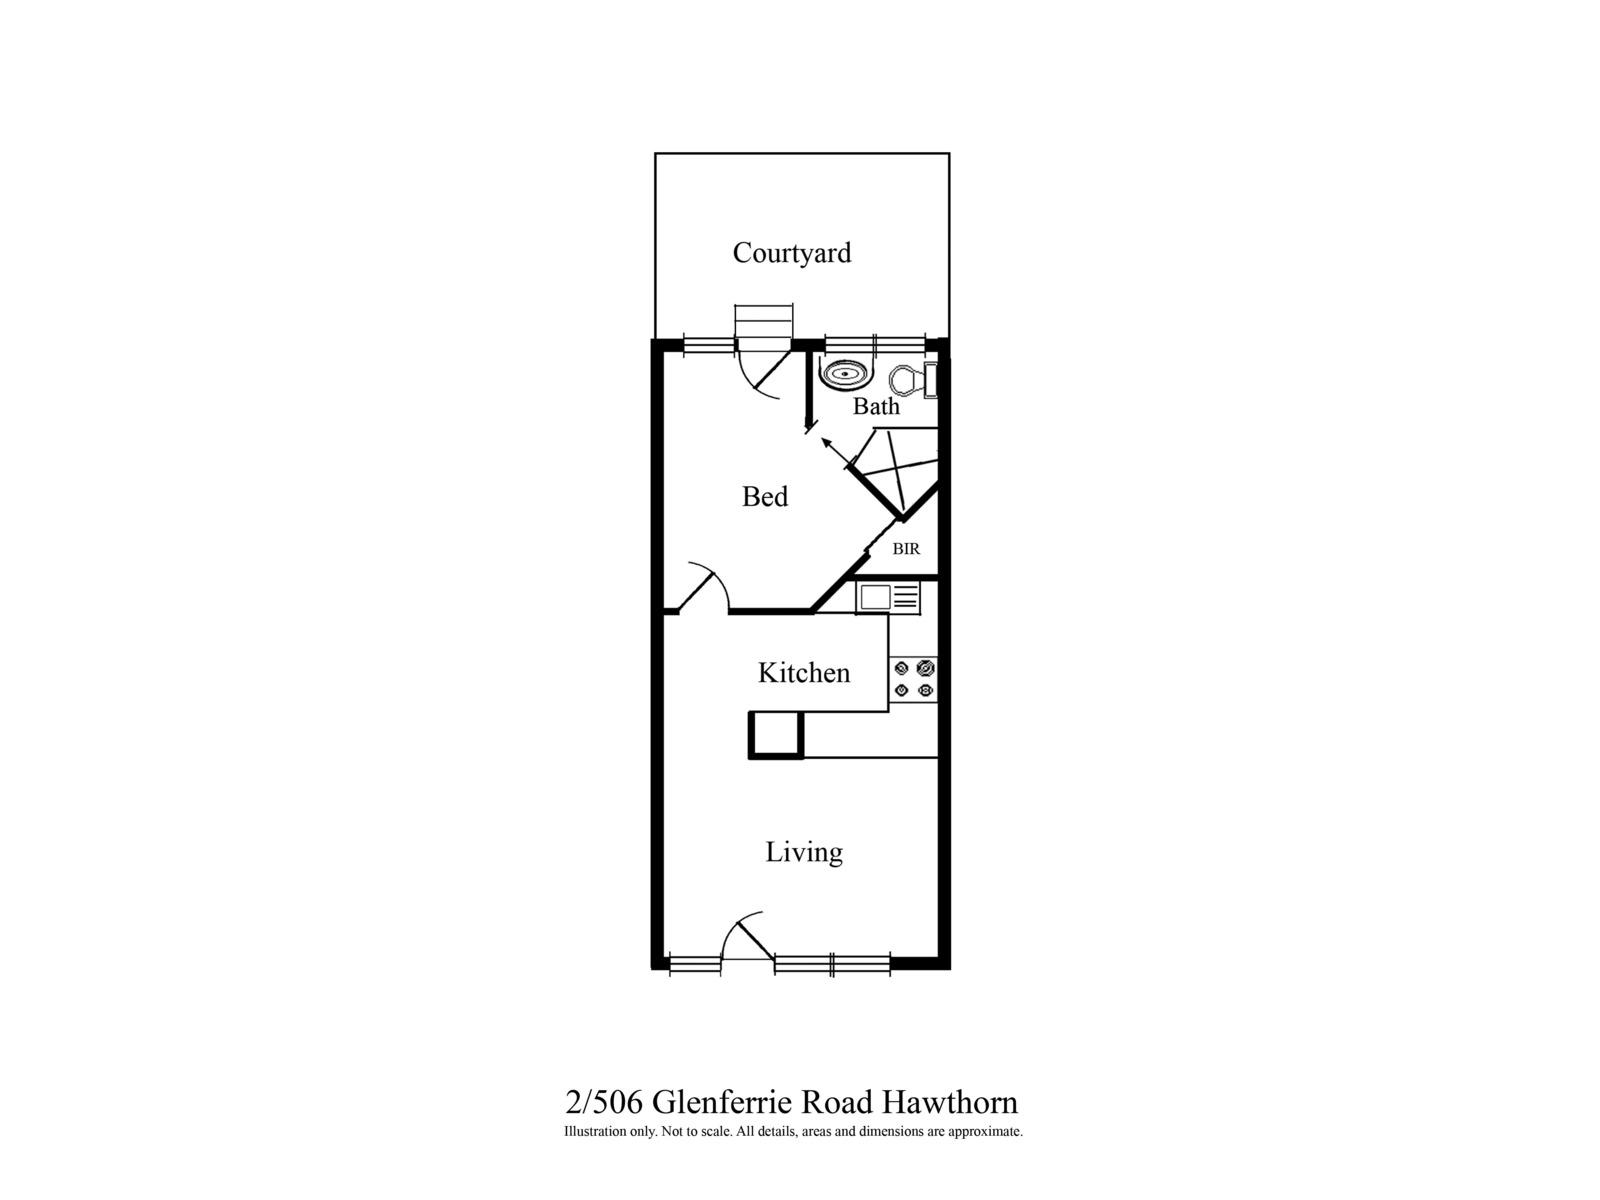 2 / 506 Glenferrie Road, Hawthorn